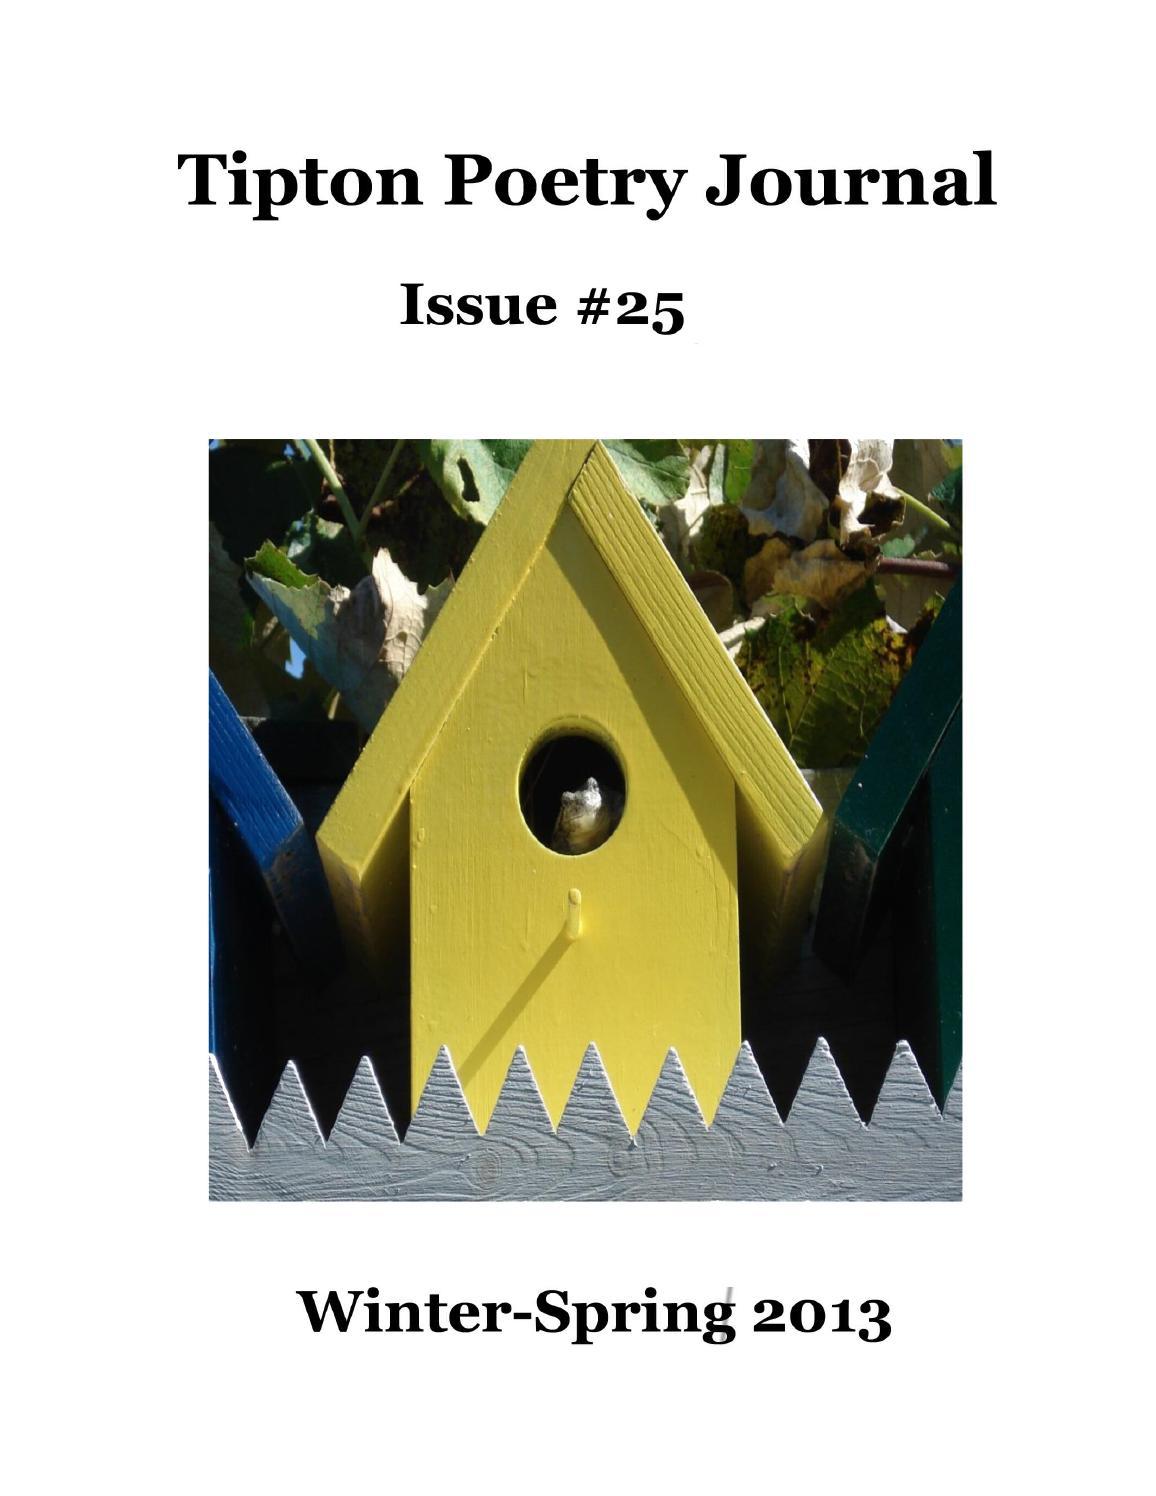 Tipton Poetry Journal - #25 by Tipton Poetry Journal - issuu